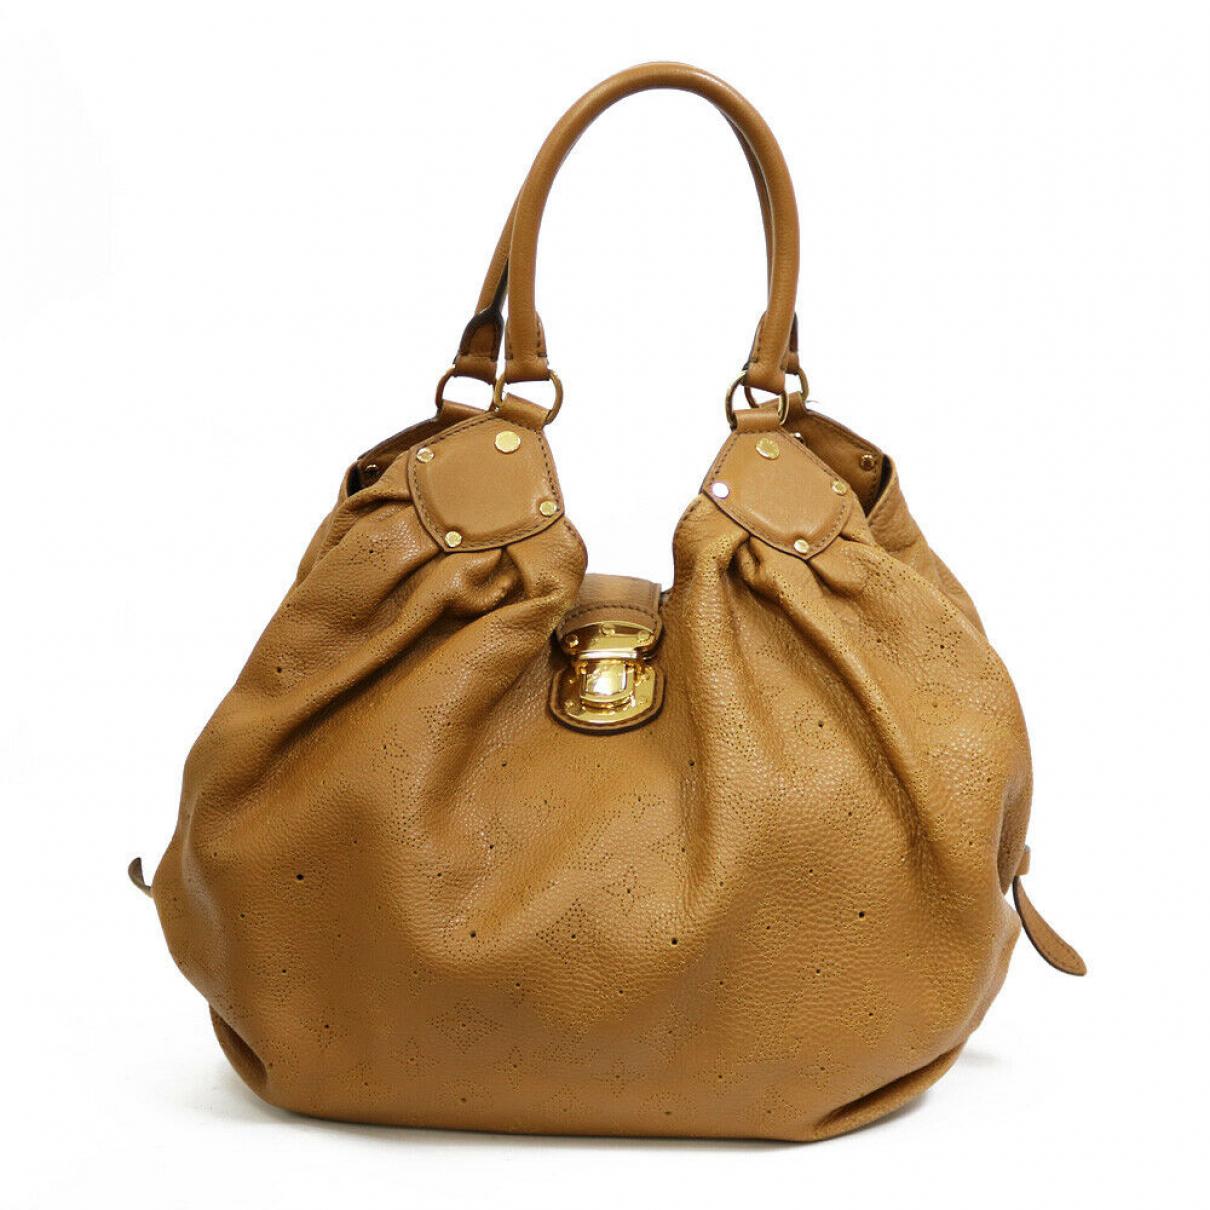 Louis Vuitton N Beige Leather handbag for Women N